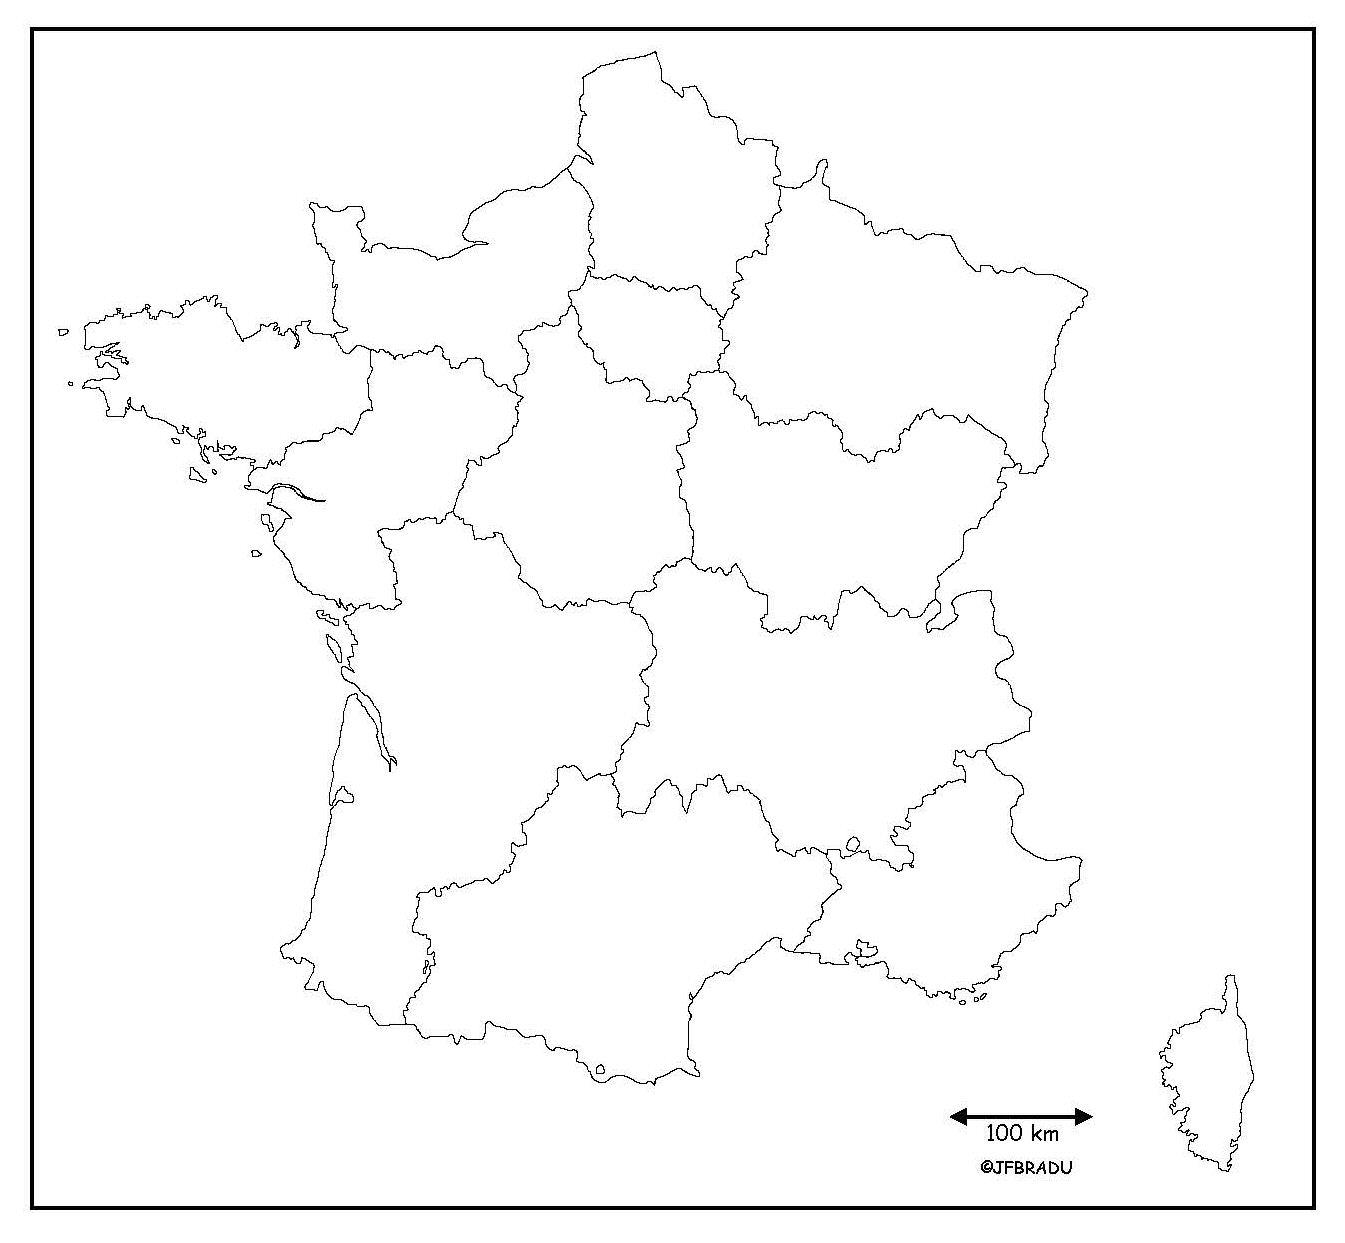 Carte Des Regions De France A Completer | popkensburg